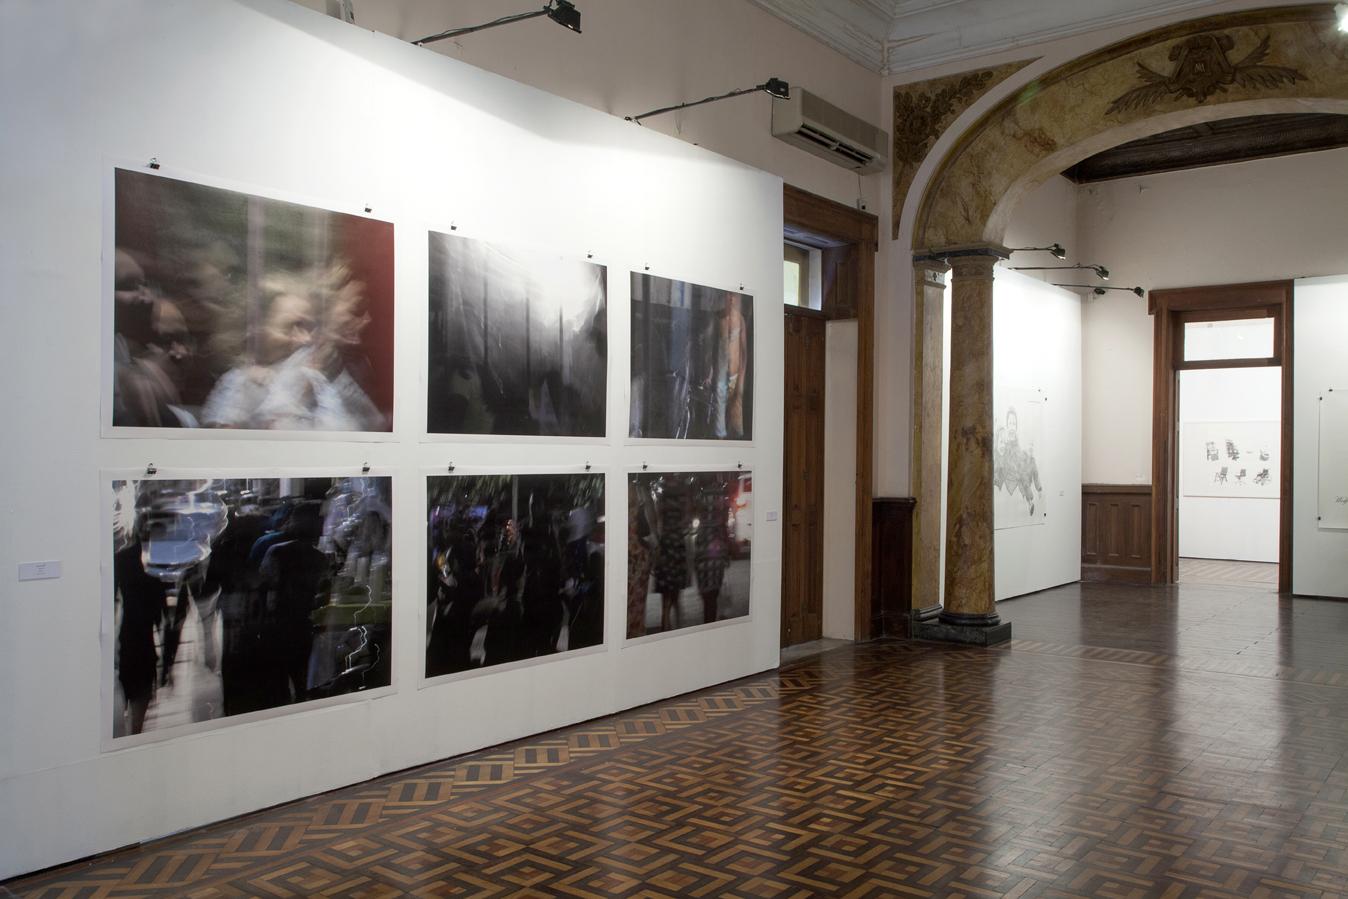 Pelas Sombras, Museu da UFPA, Belém, 2017